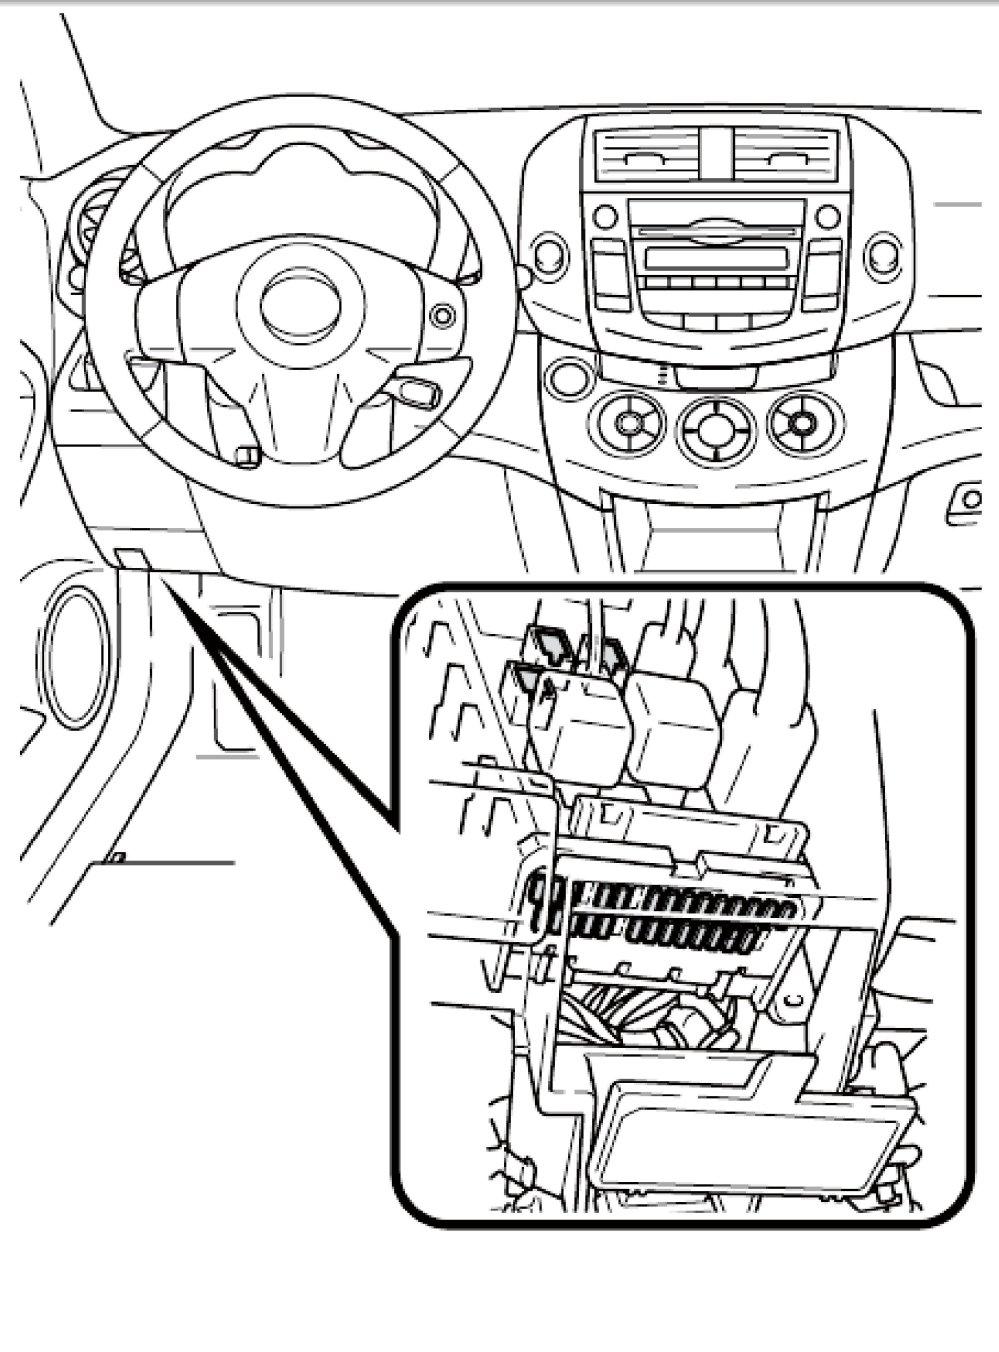 medium resolution of 98 mercury tracer fuse diagram online wiring diagram1998 mercury sable fuse box diagram wiring diagram database1996